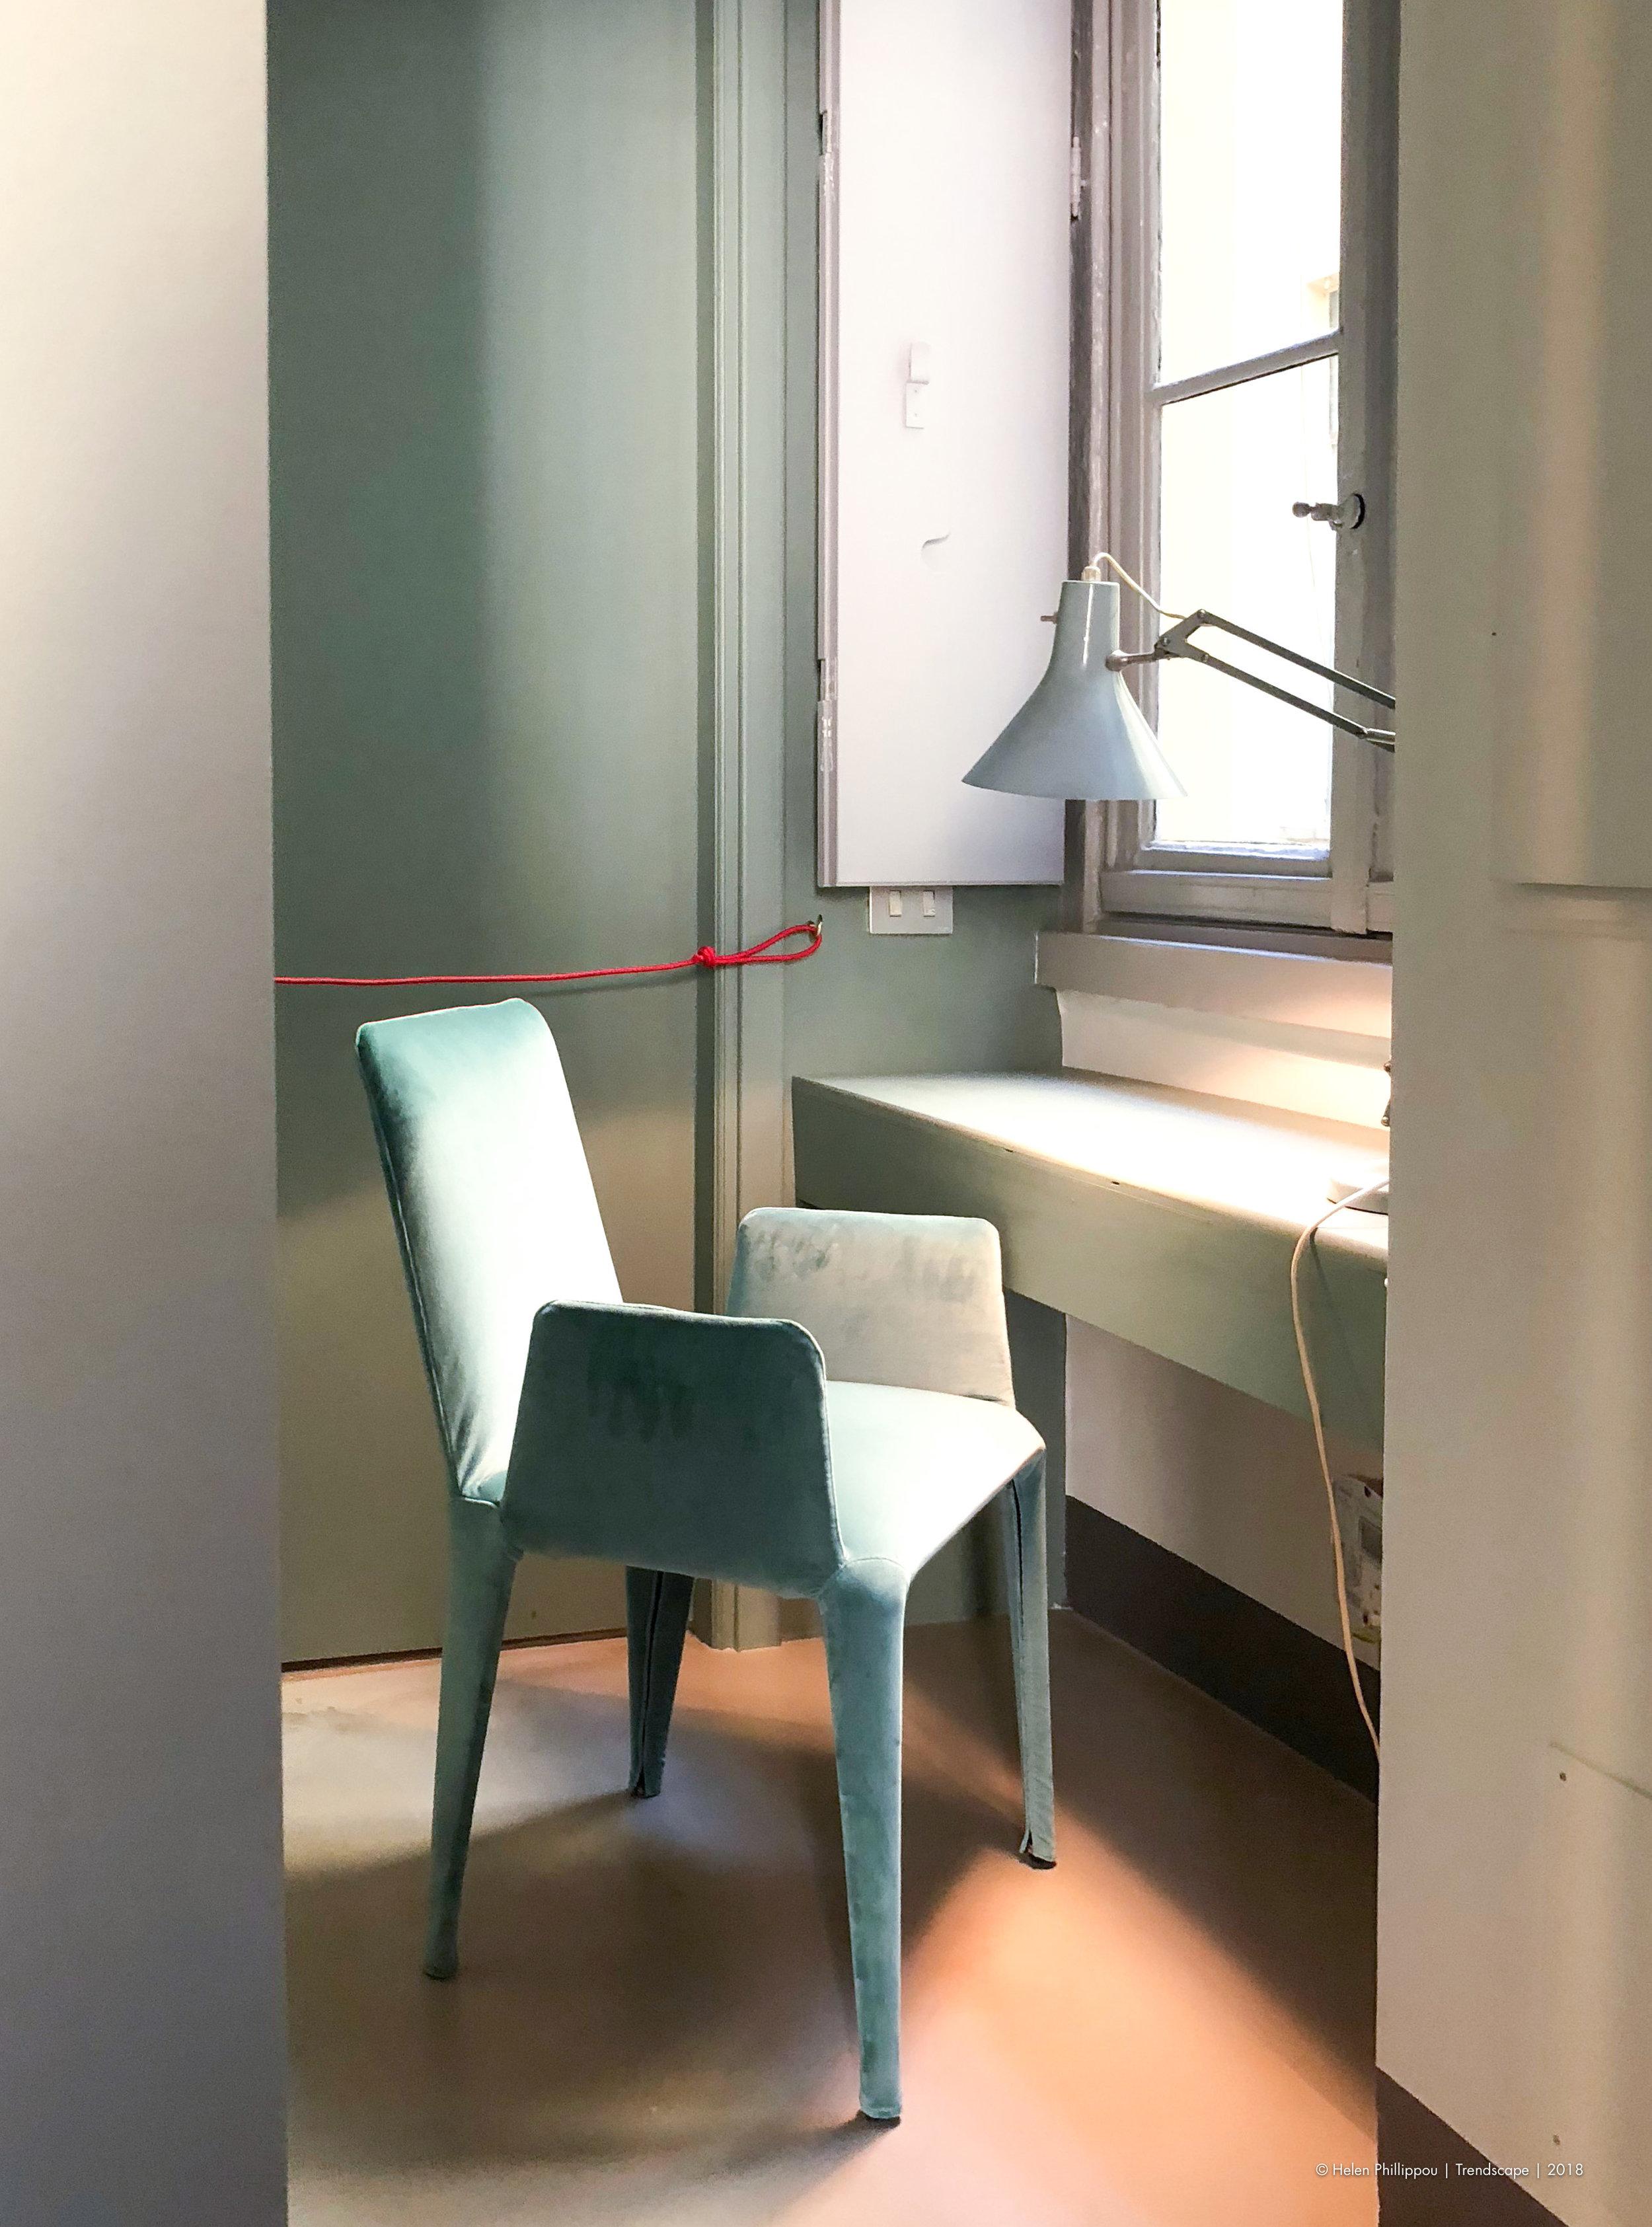 Giovanni Cagnato Milan Design Week 2018 4.jpg